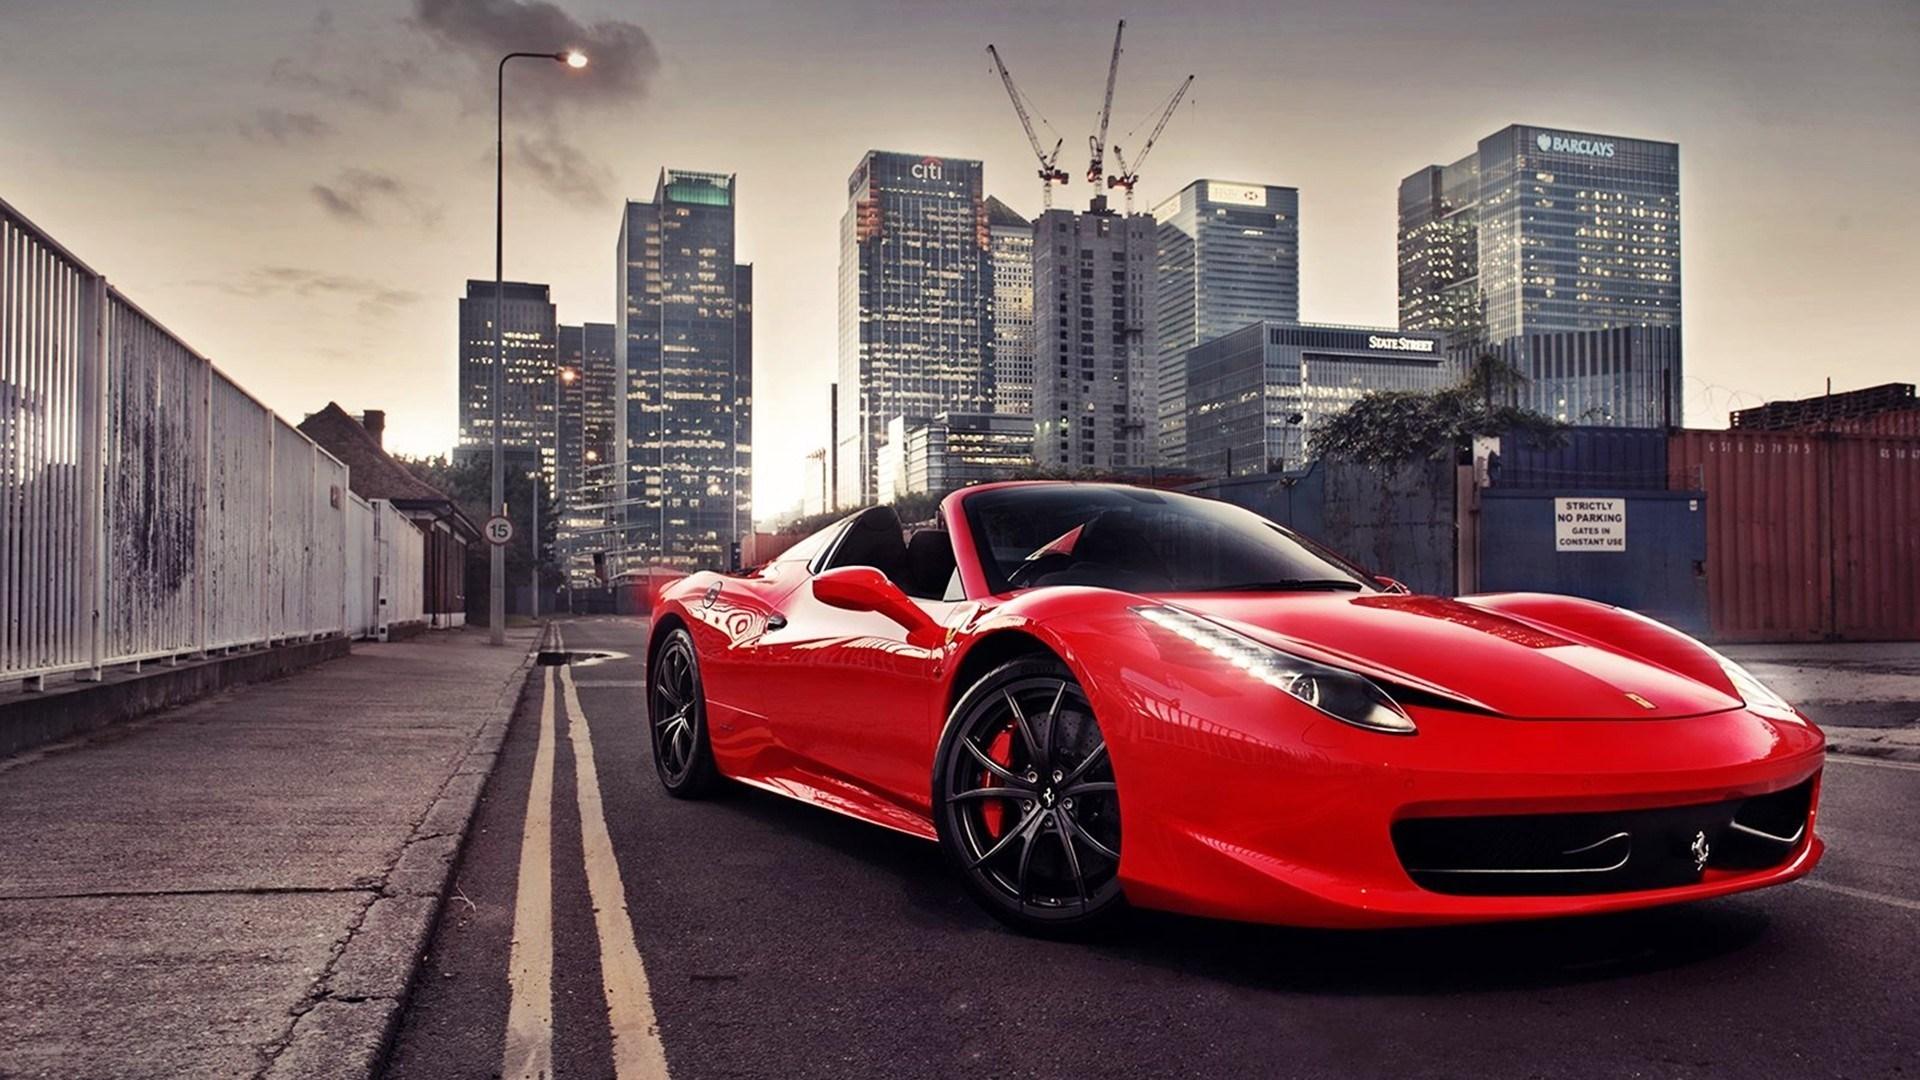 Amazing Ferrari 458 Wallpaper 37620